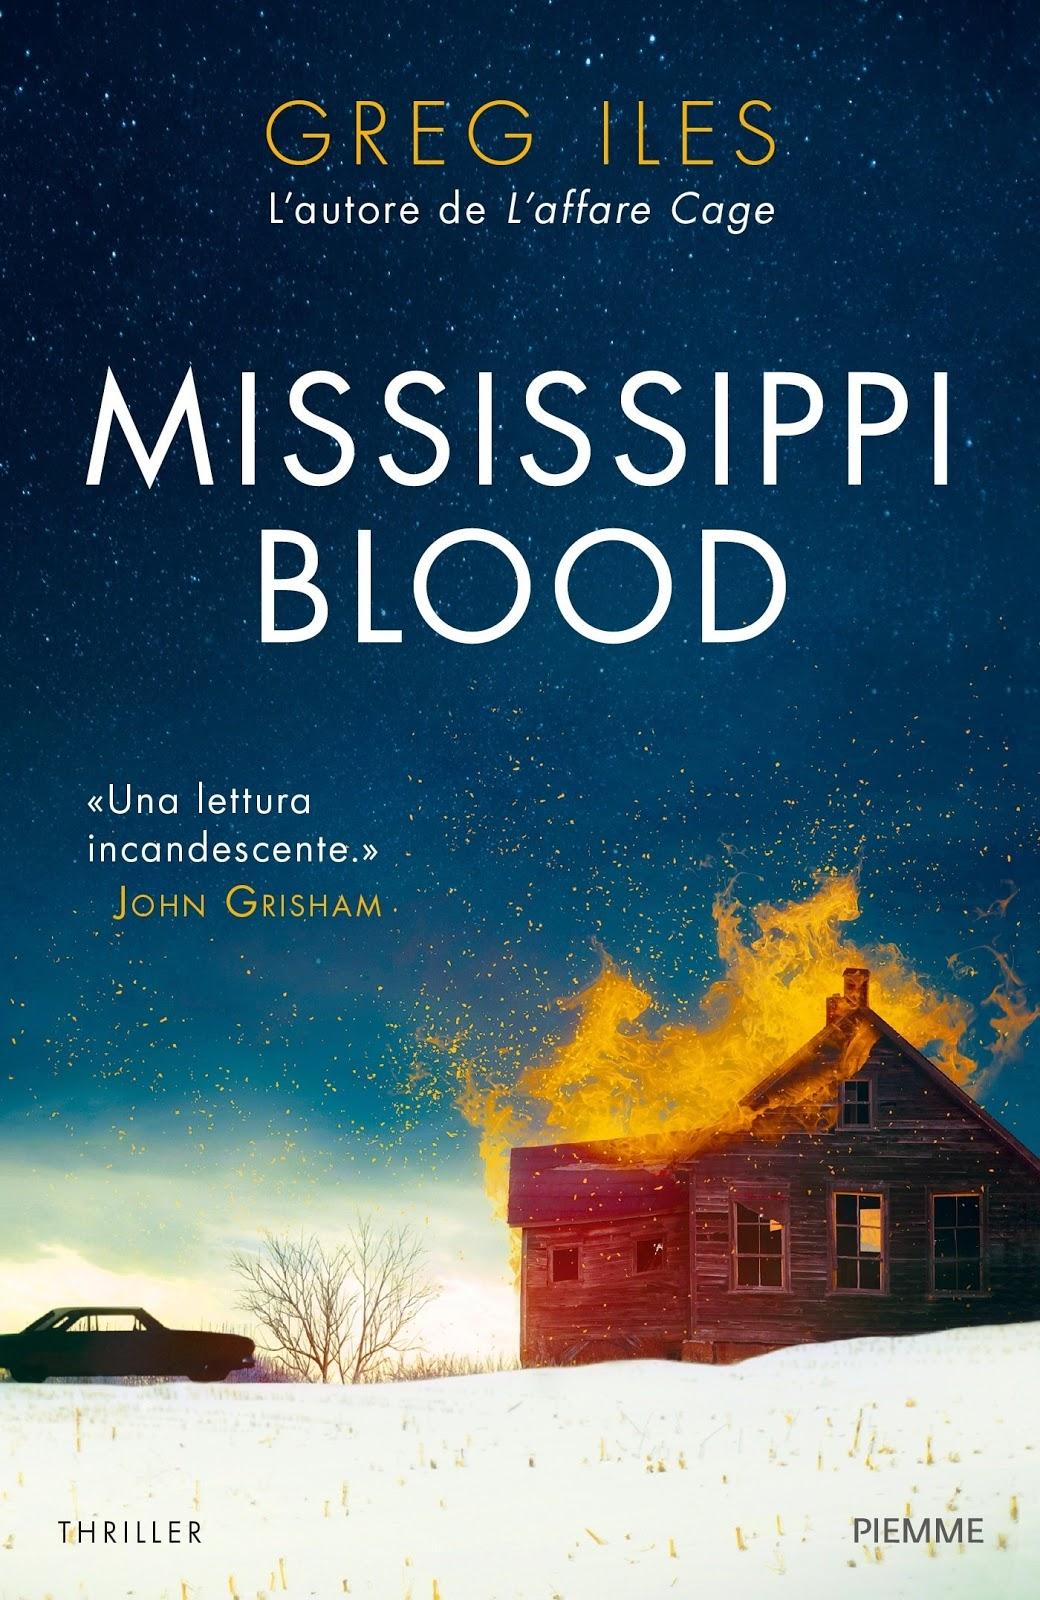 Mississippi blood di Greg Iles